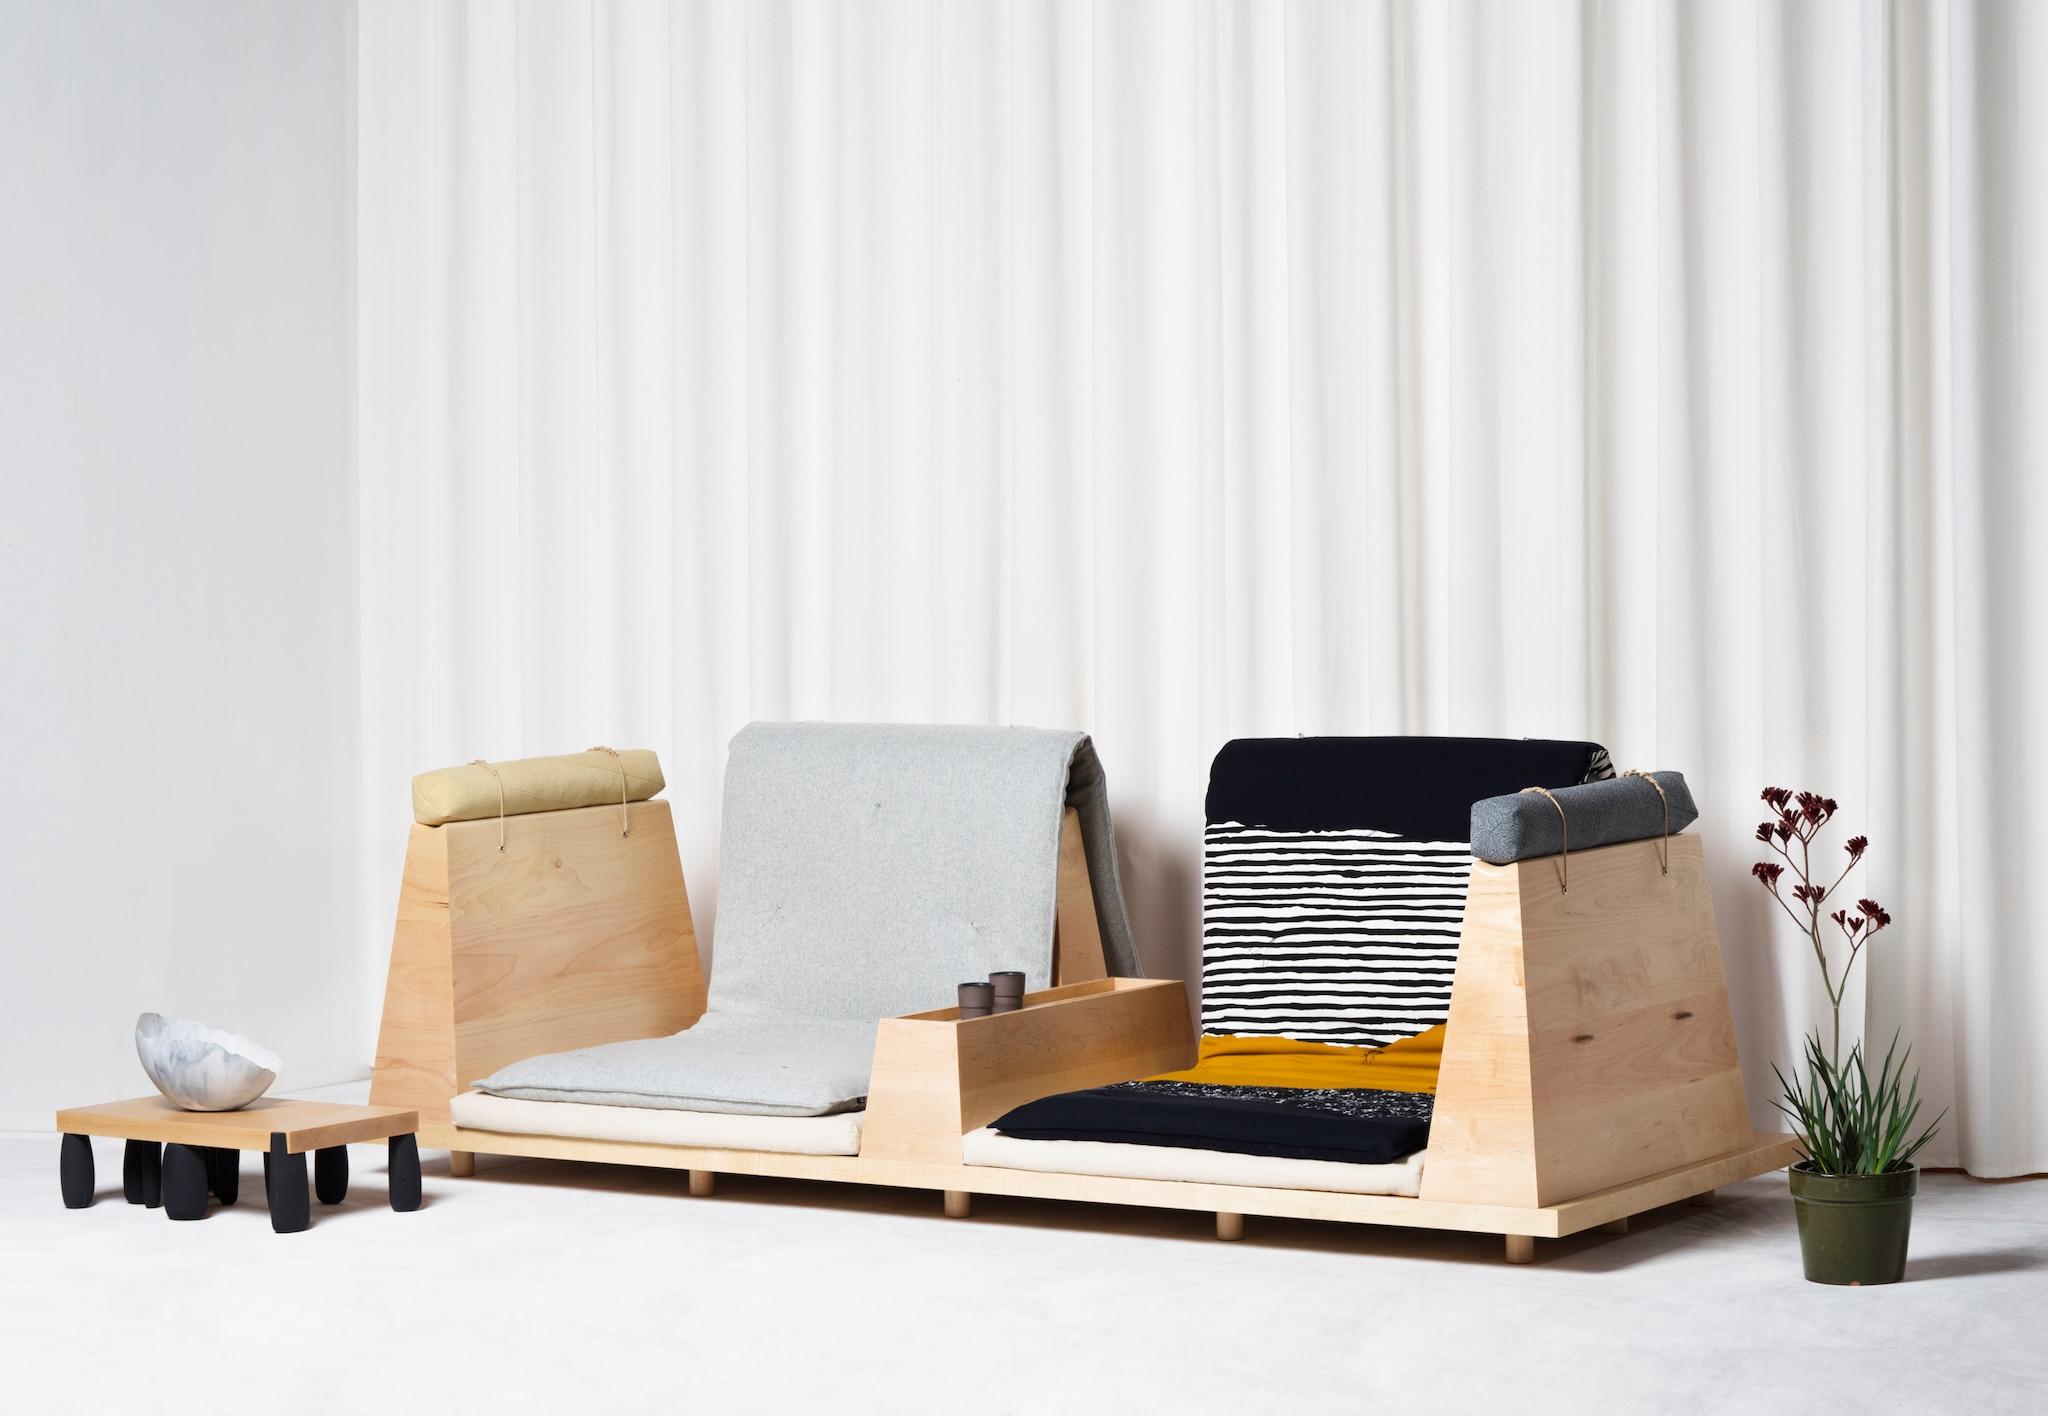 Zabuton Sofa: Reworking Of The Traditional Japanese Pillow Designed By UMÉ Studio